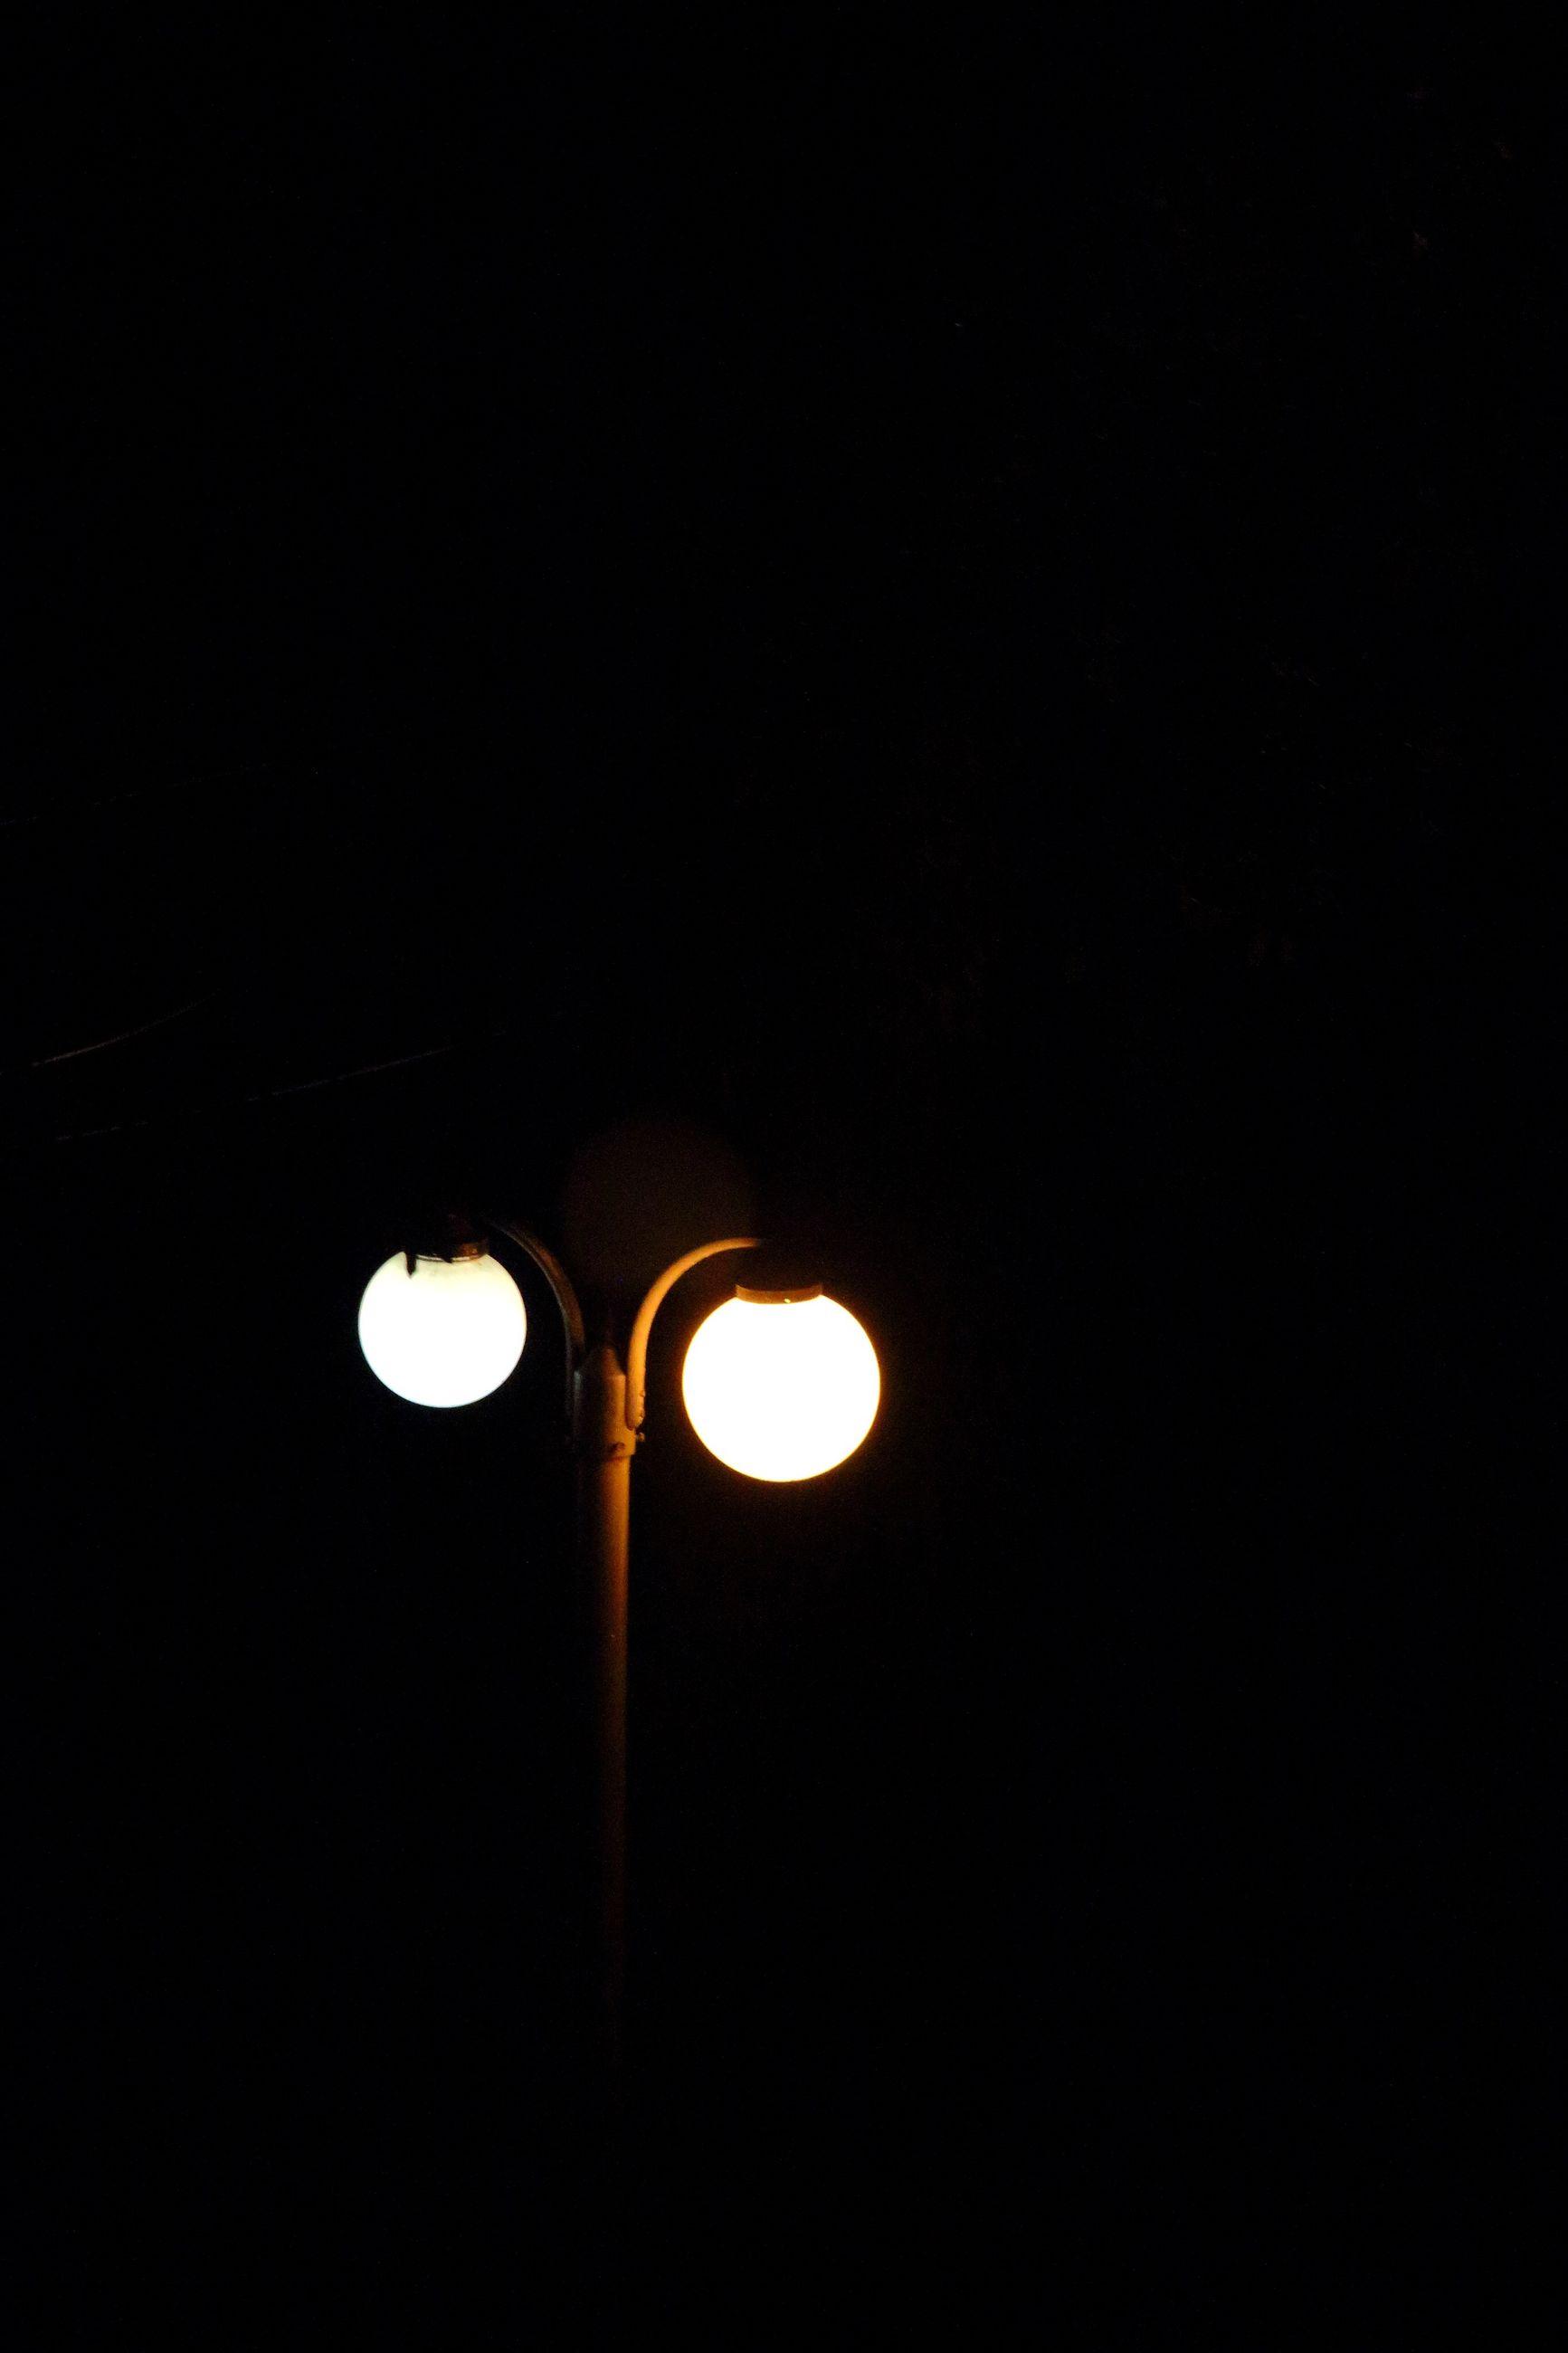 illuminated, no people, lighting equipment, low angle view, night, dark, outdoors, nature, black background, close-up, sky